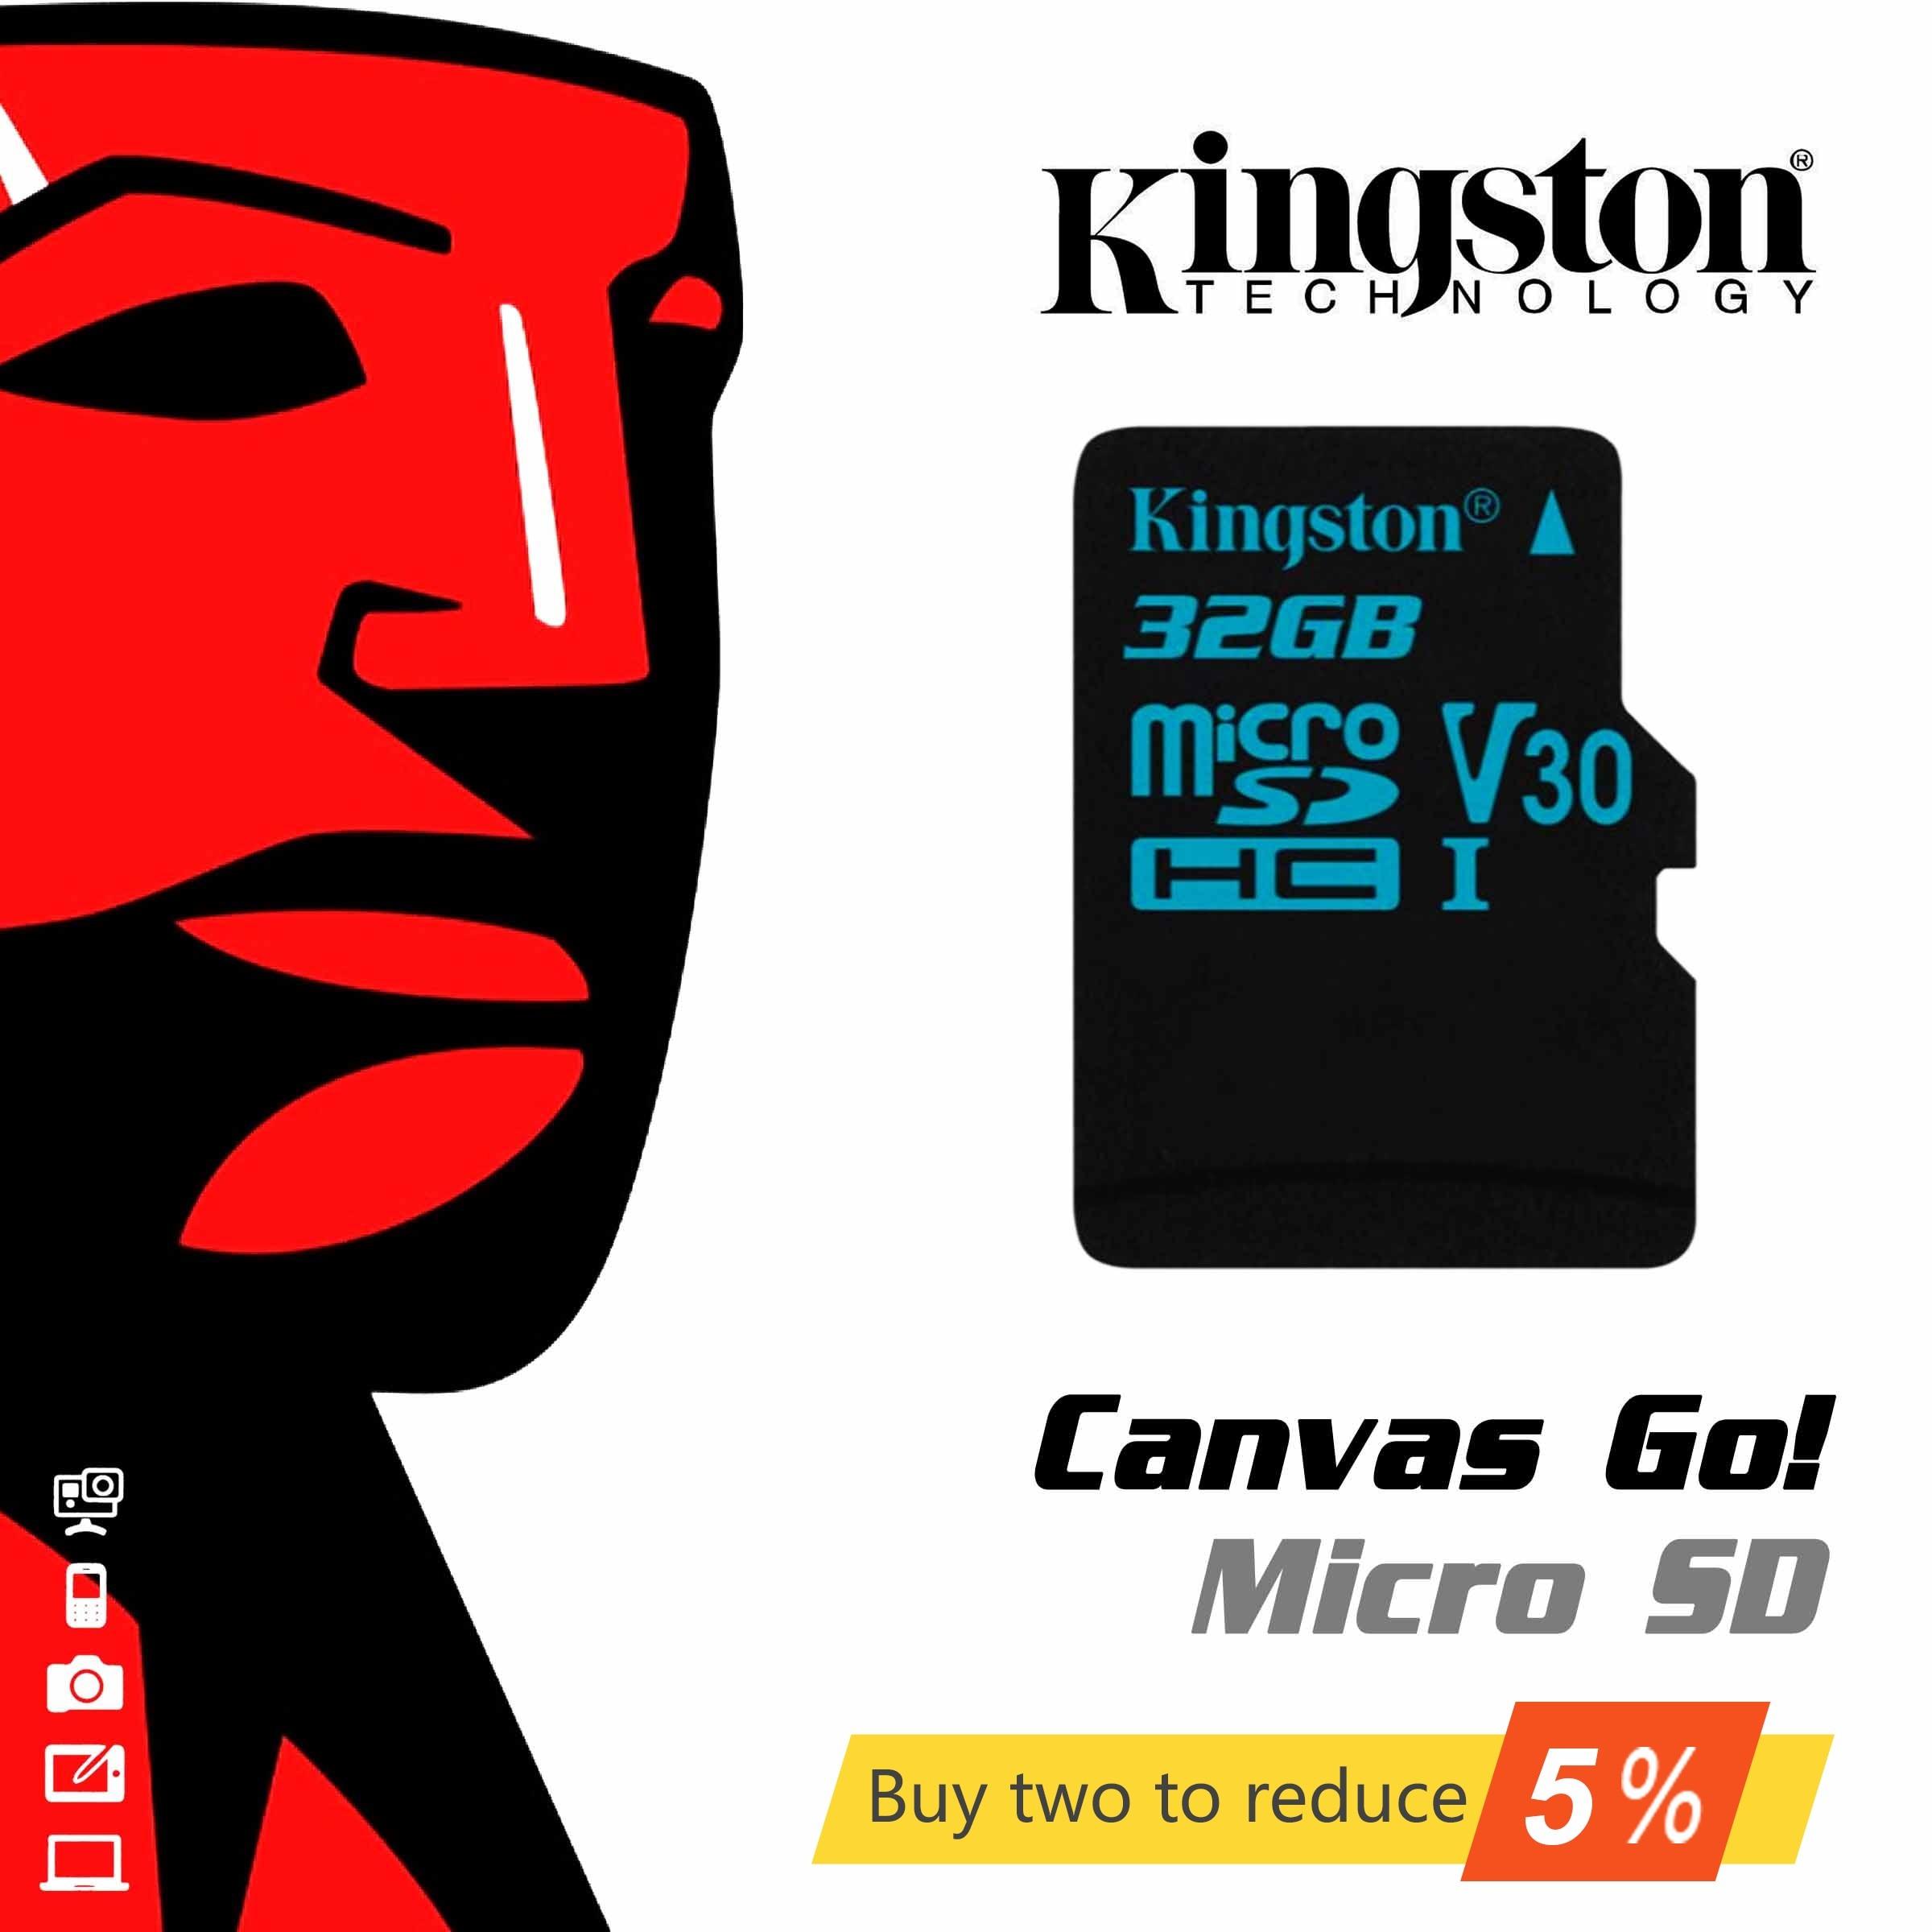 Original de Kingston Digital 32GB 64GB microSDHC UHS-I velocidad de ir a clase 10 tarjeta de memoria Flash (SDCG2/32GB/64GB/128GB)